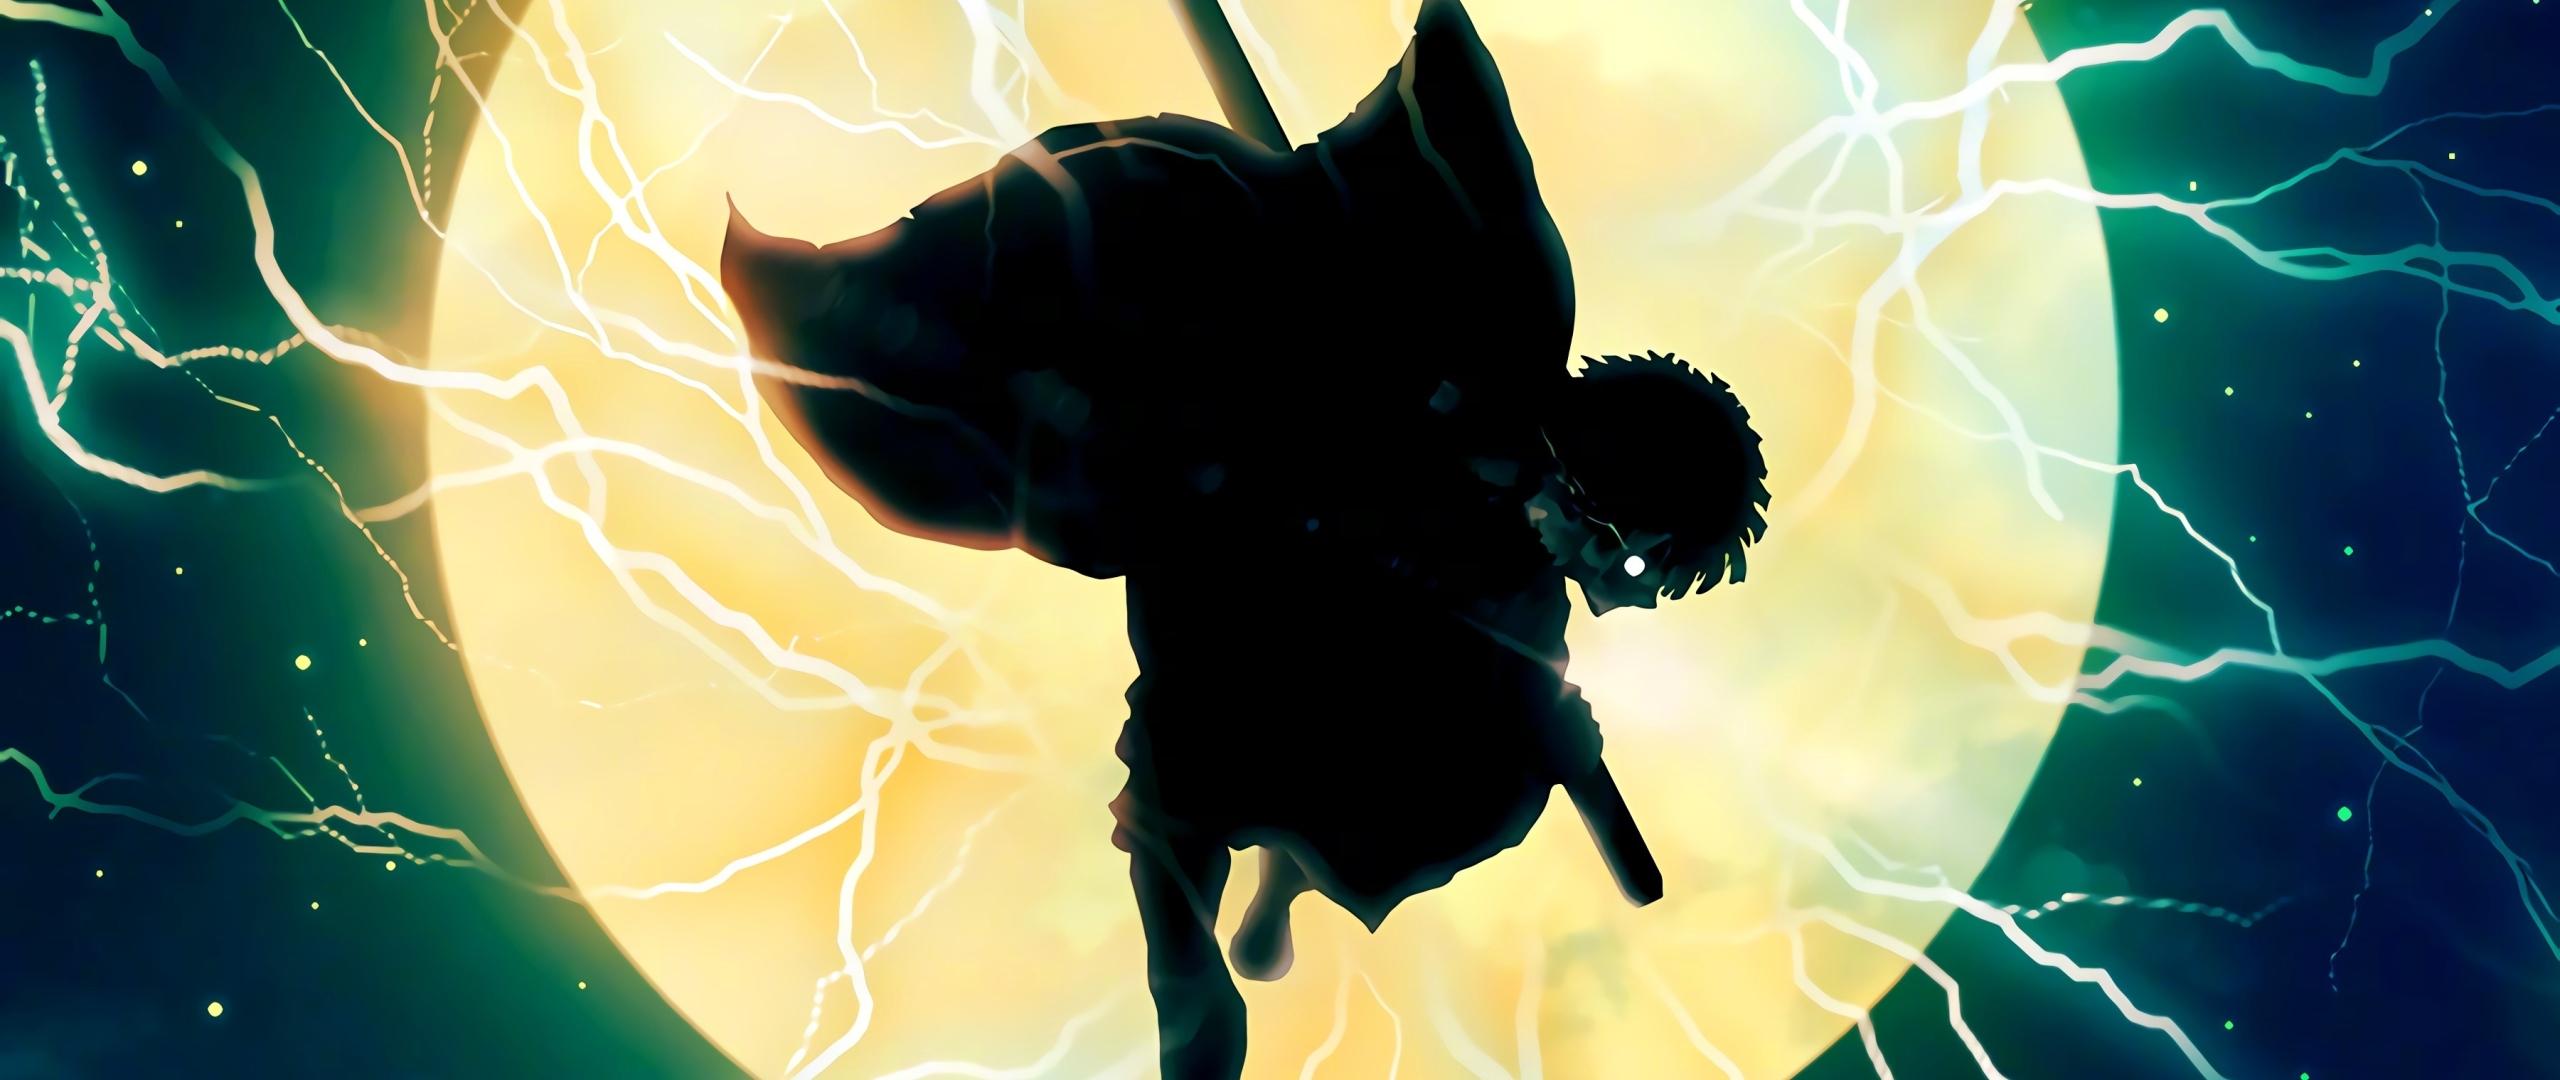 2560x1080 Zenitsu Agatsuma Demon Slayer Art 2560x1080 ...